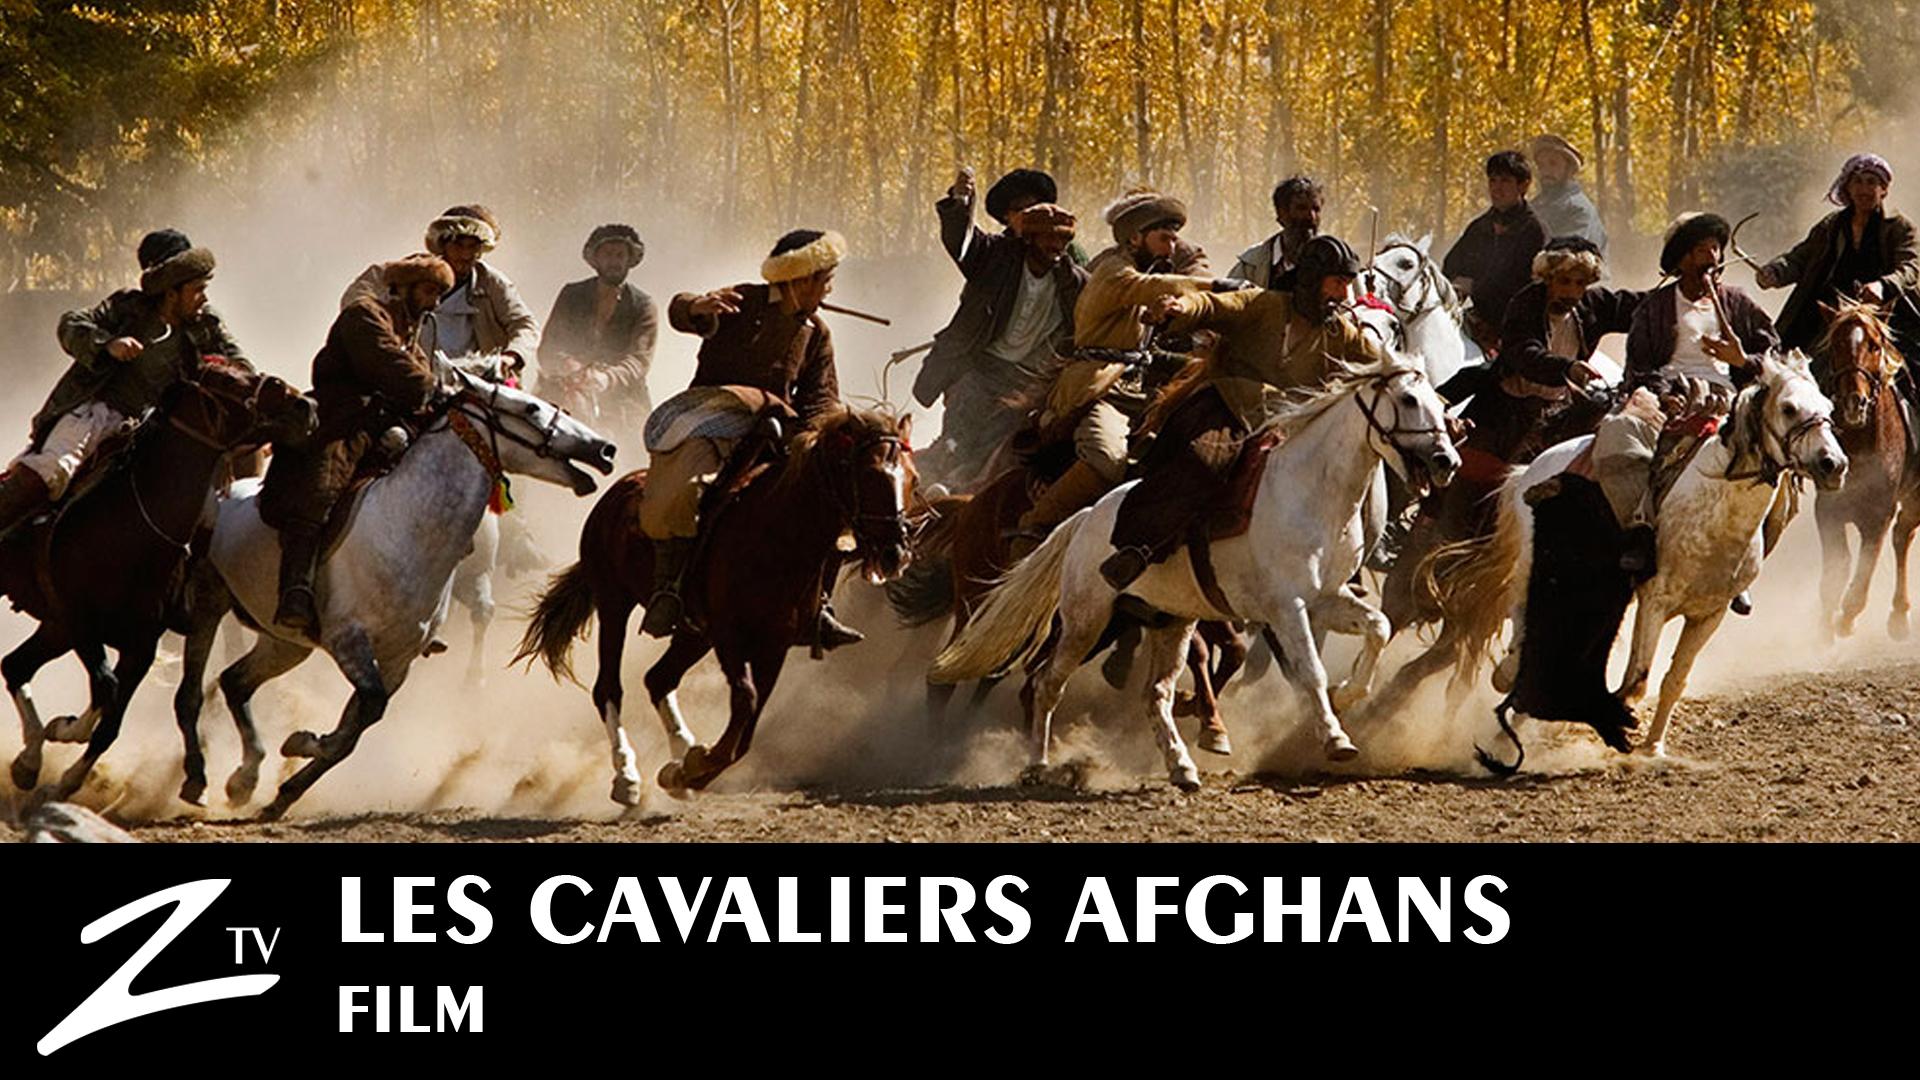 vyoutube-les-cavaliers-afghans